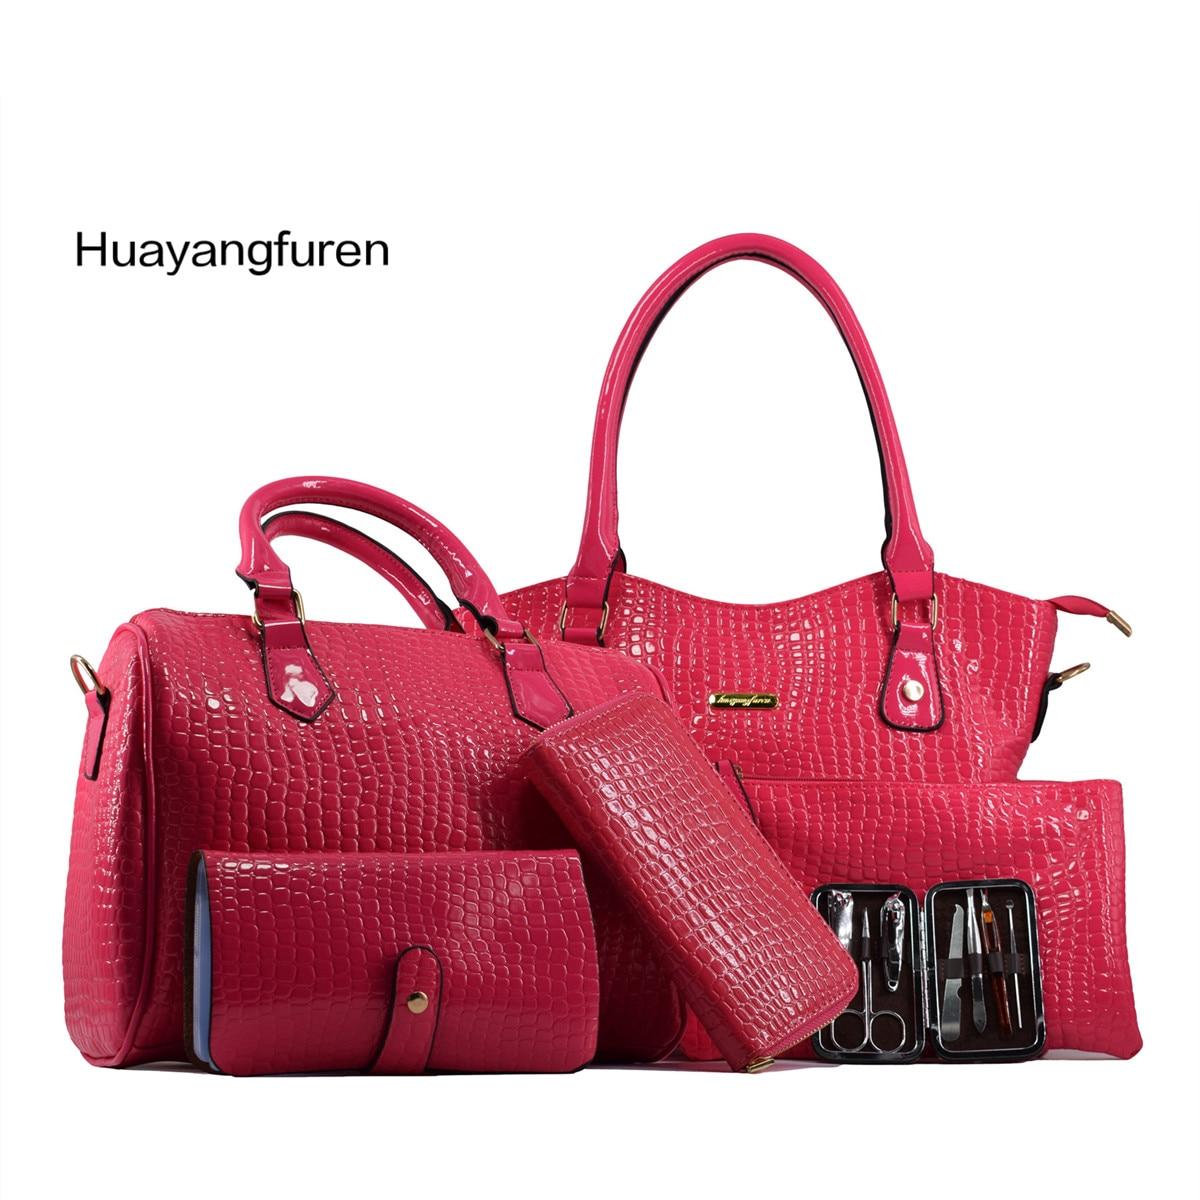 6 pieces set High capacity Top Handle Bag famous brand women shoulder bag Alligator grain Handbag